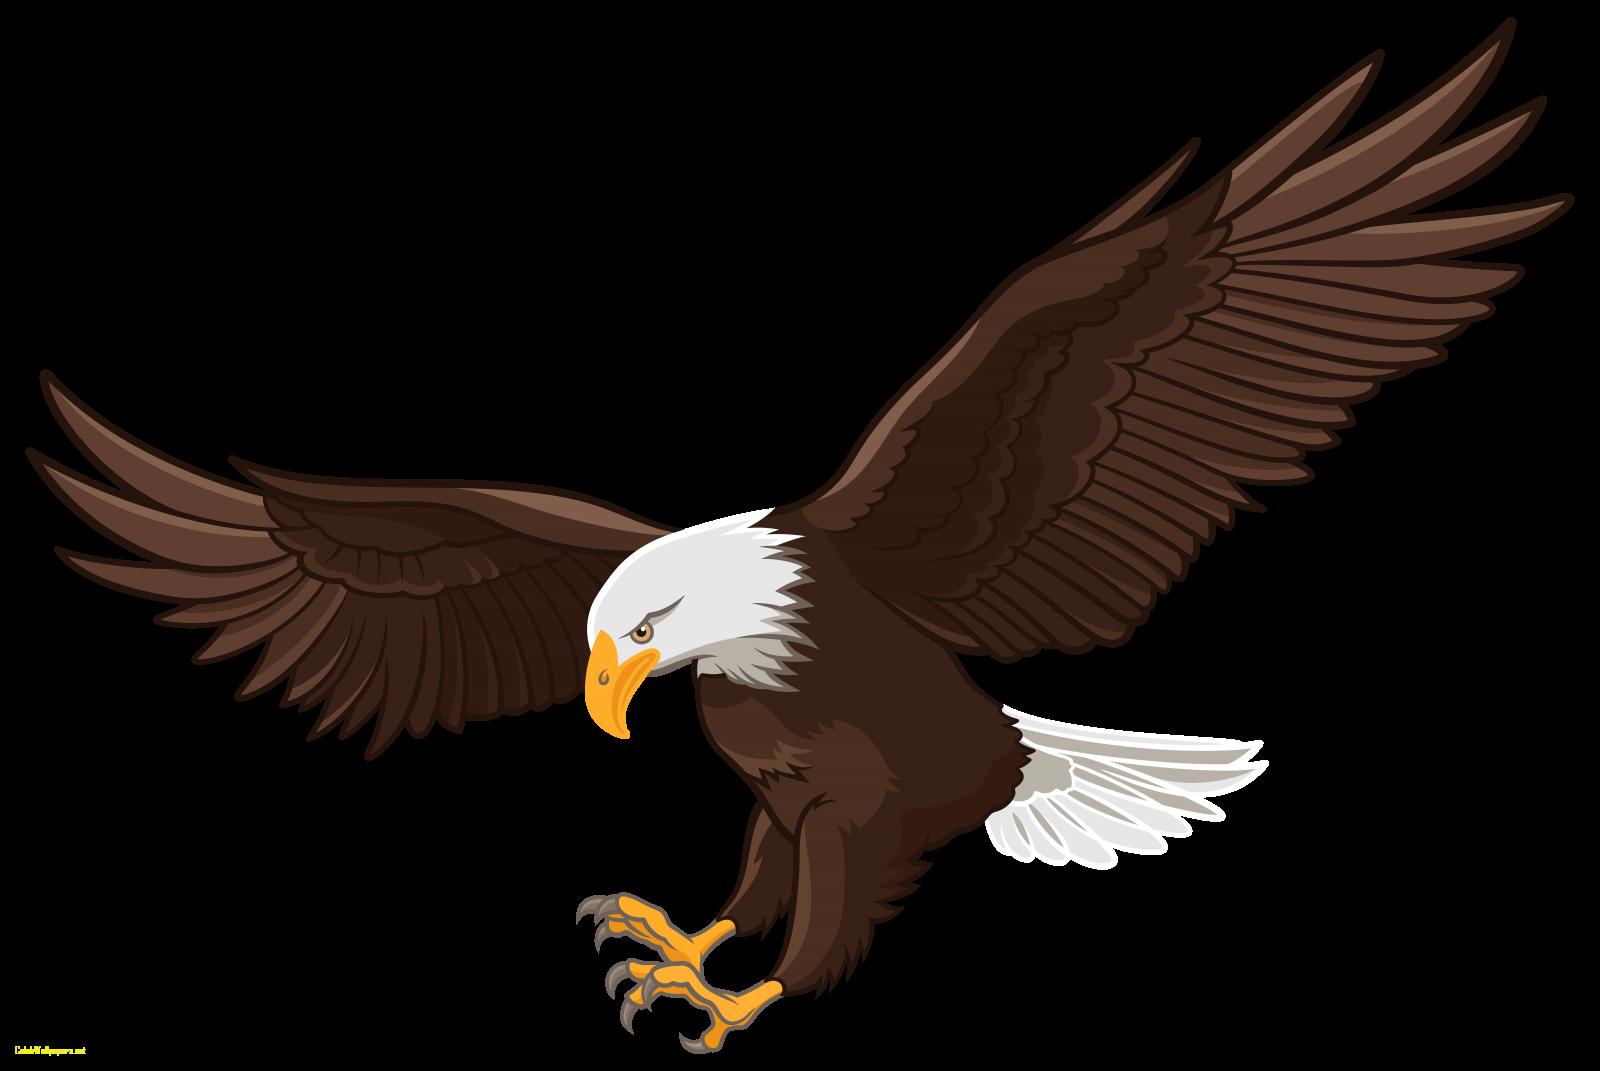 Bald eagle clipart images png black and white library eagles clipart file #306 | Vastu in 2019 | Eagle, Eagle images ... png black and white library